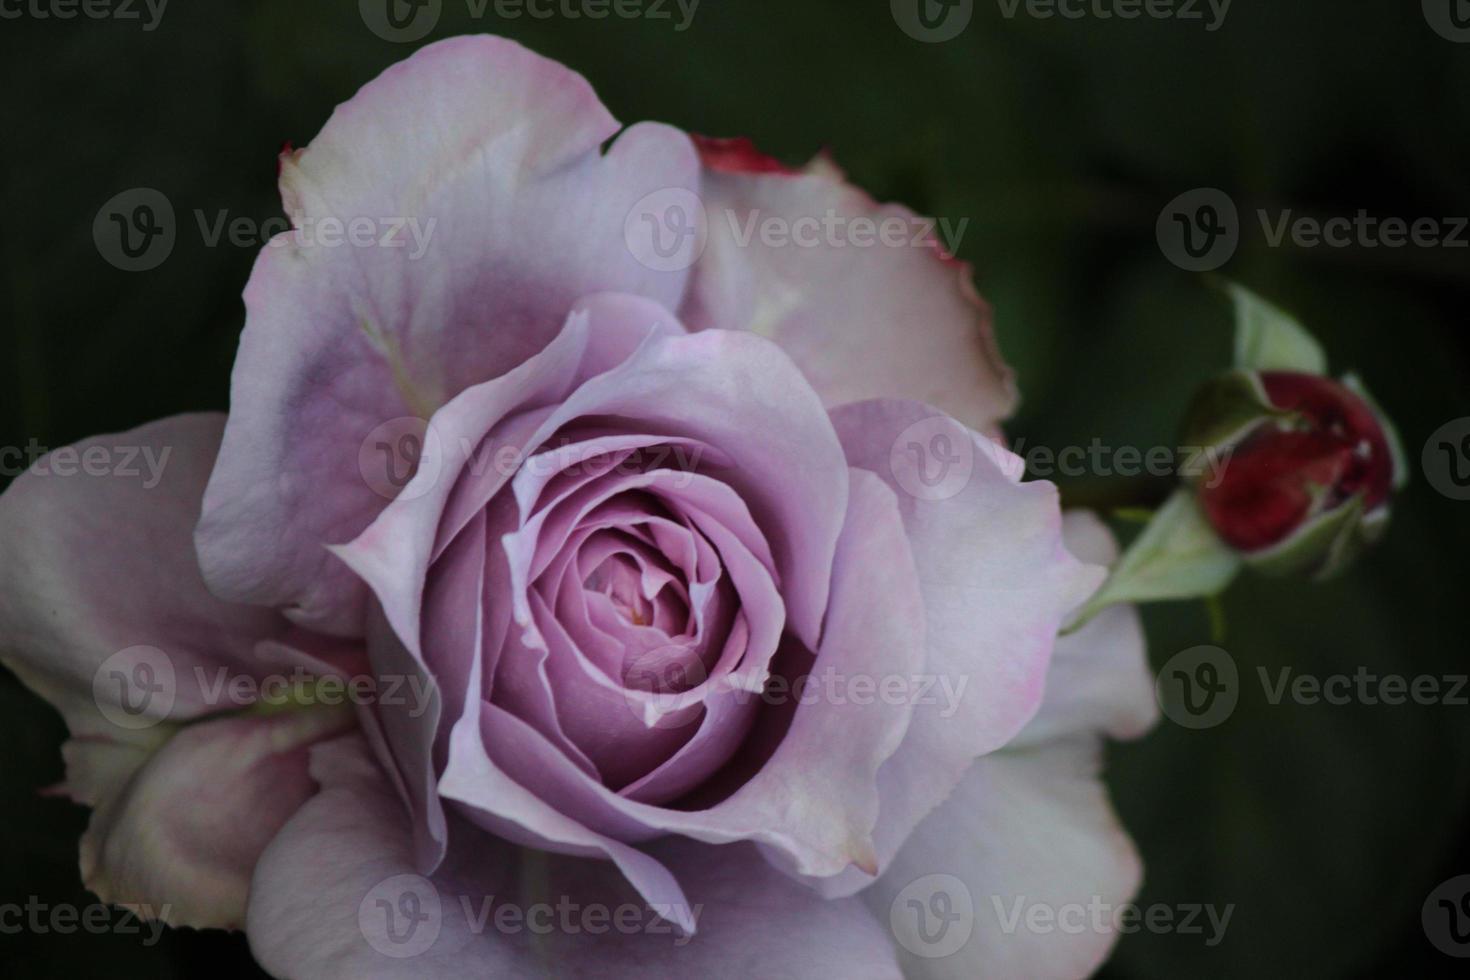 Rosa novalis - rose de haut photo